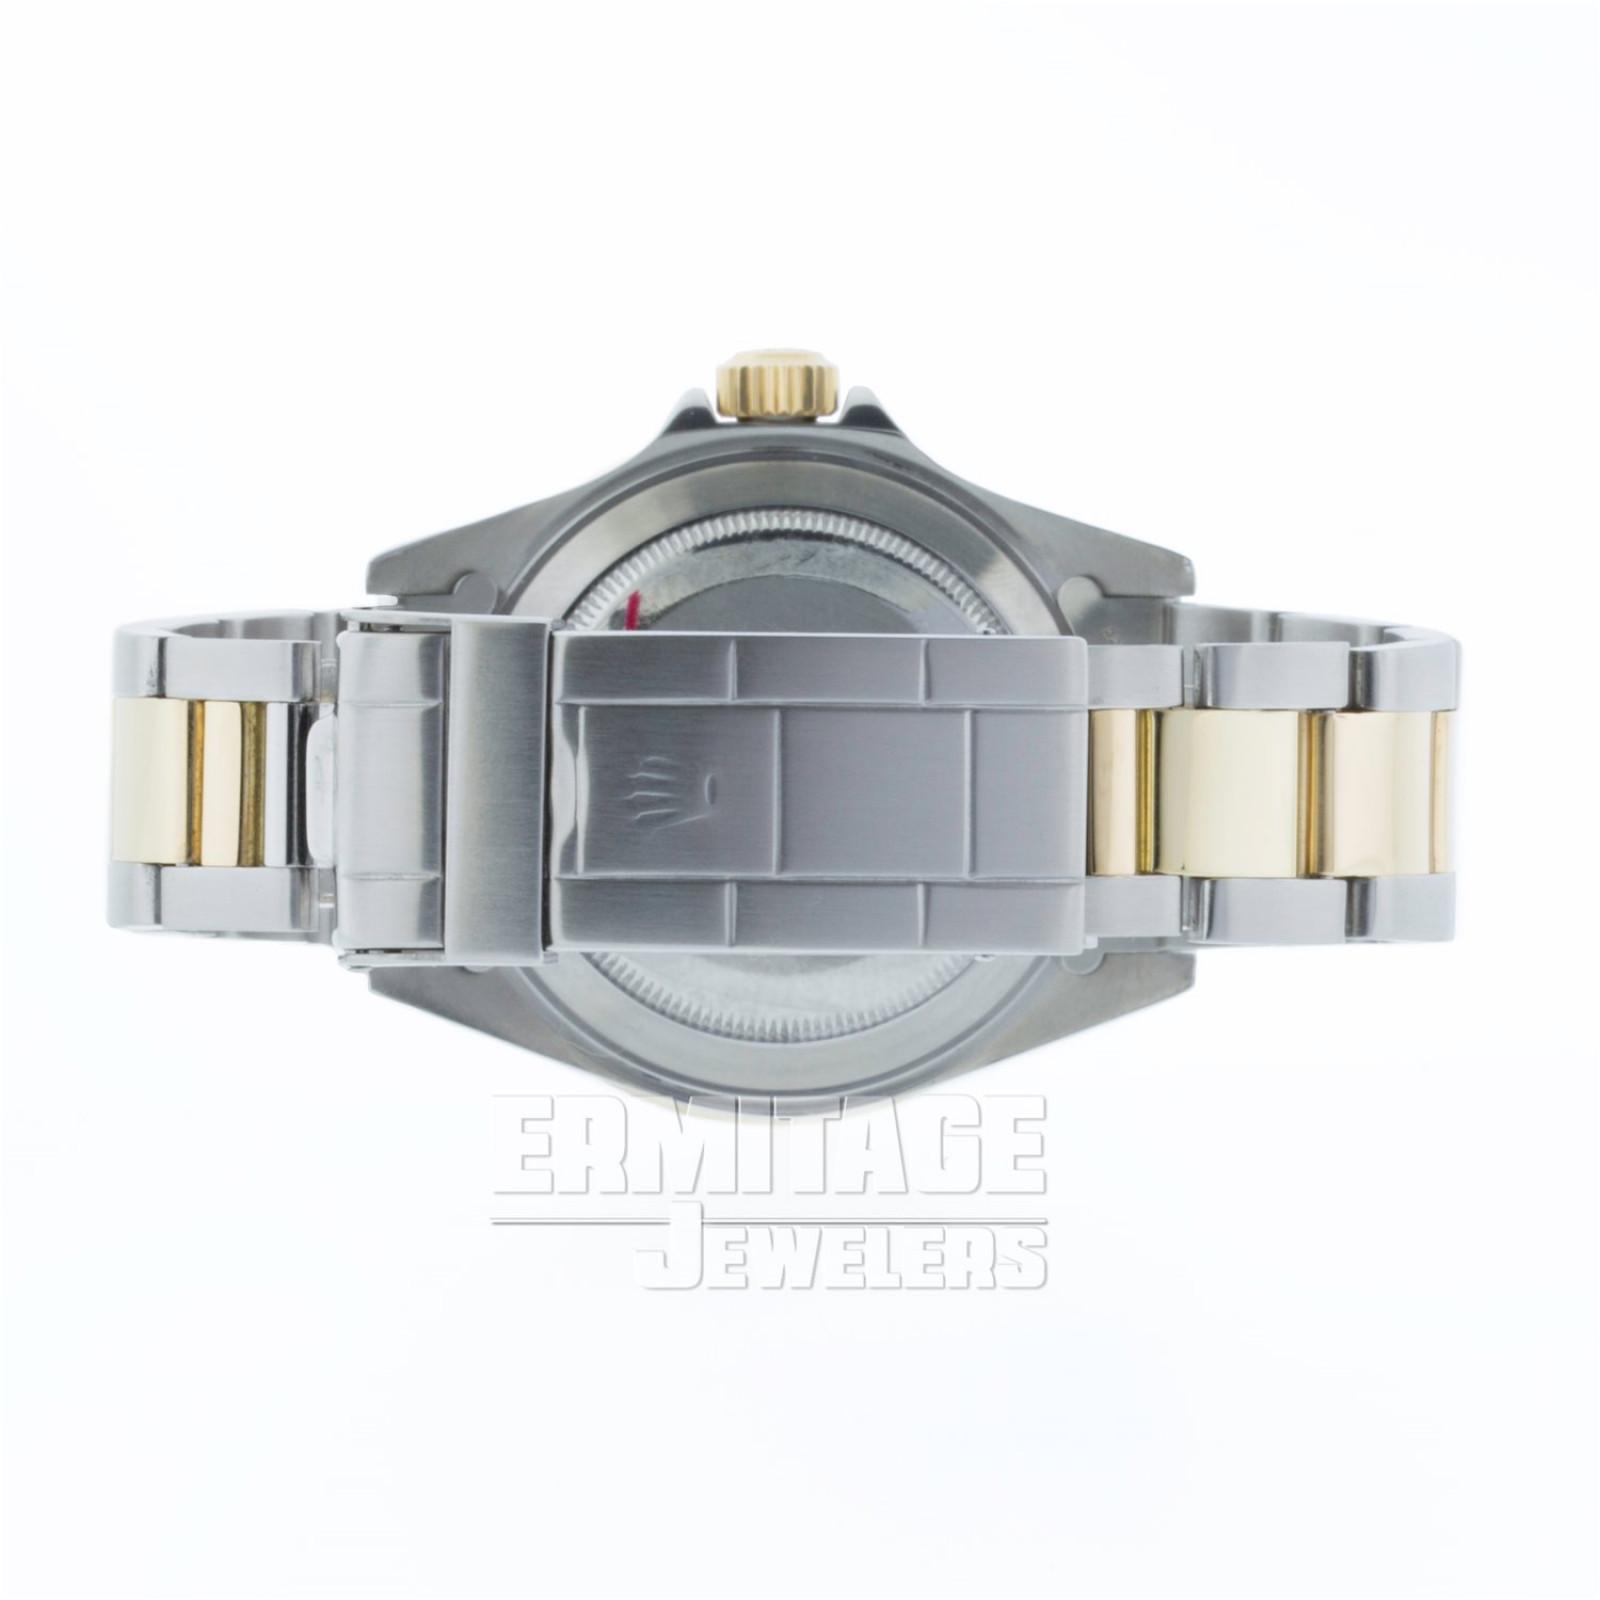 Rolex Submariner 16613 Oyster Gold & Steel 40 mm